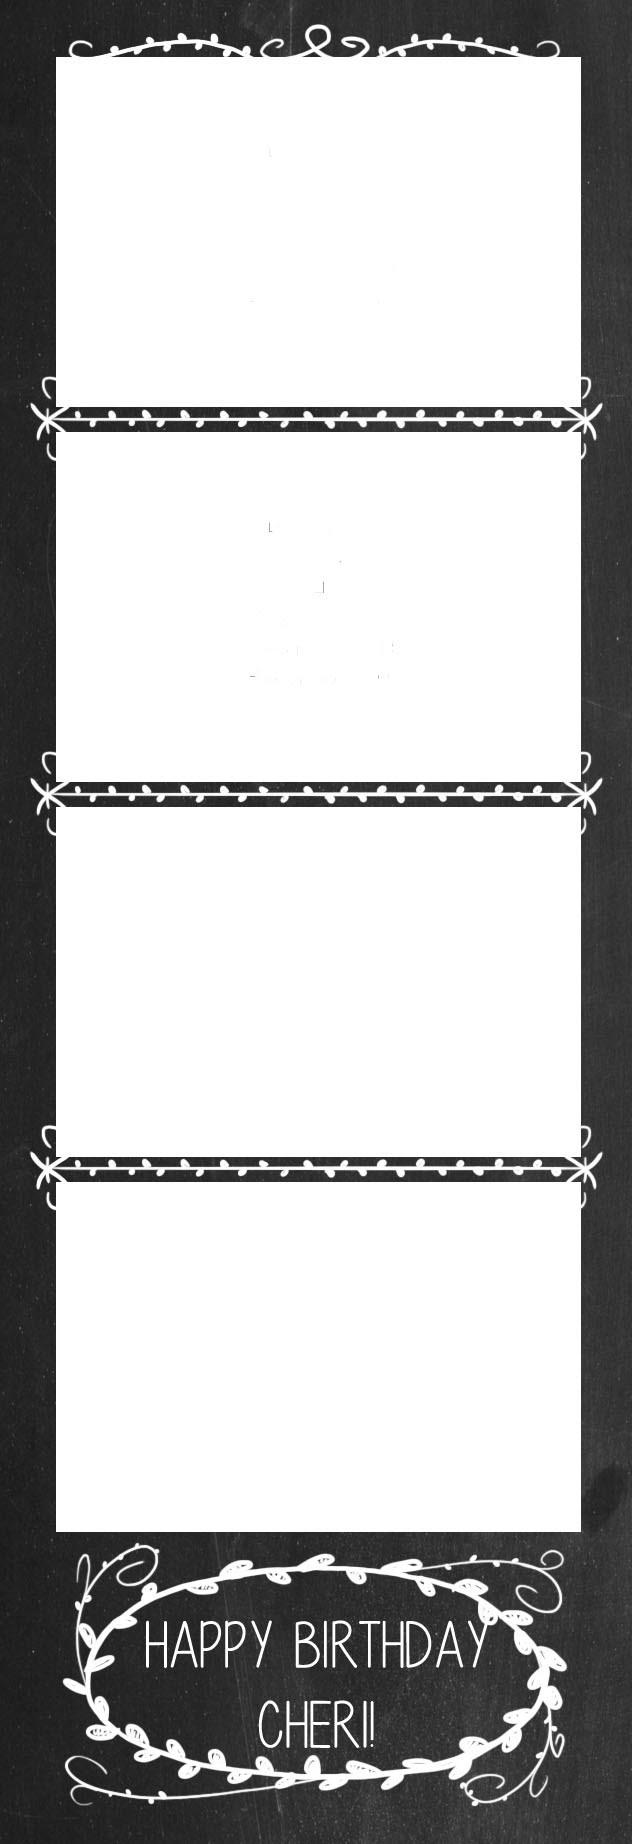 2 X 6 Photo Strips Pix Fix Photo Booth